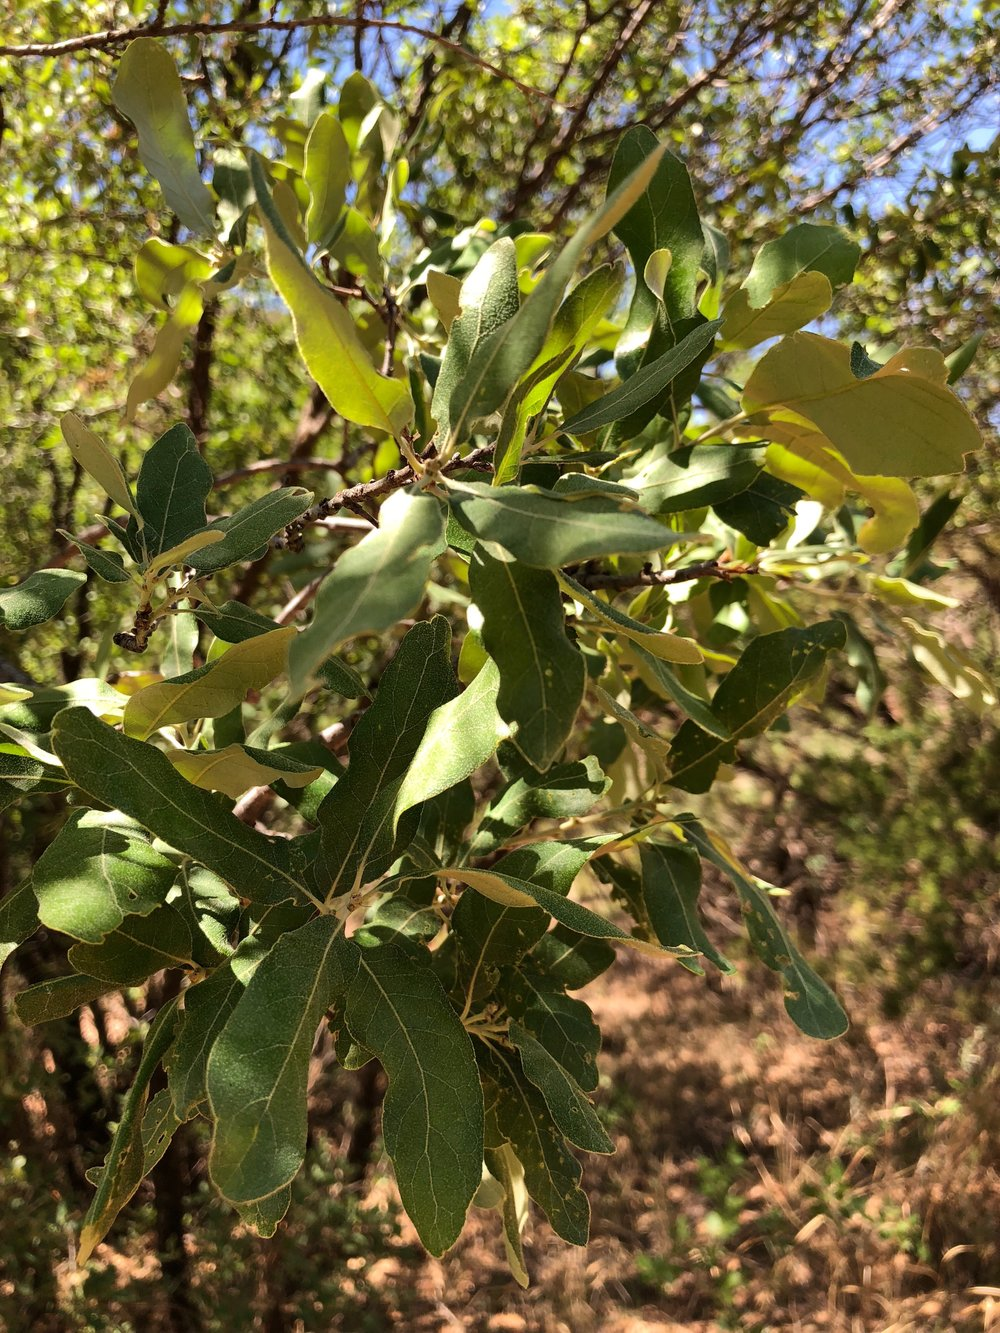 Quercus mohriana, Mohr's Oak